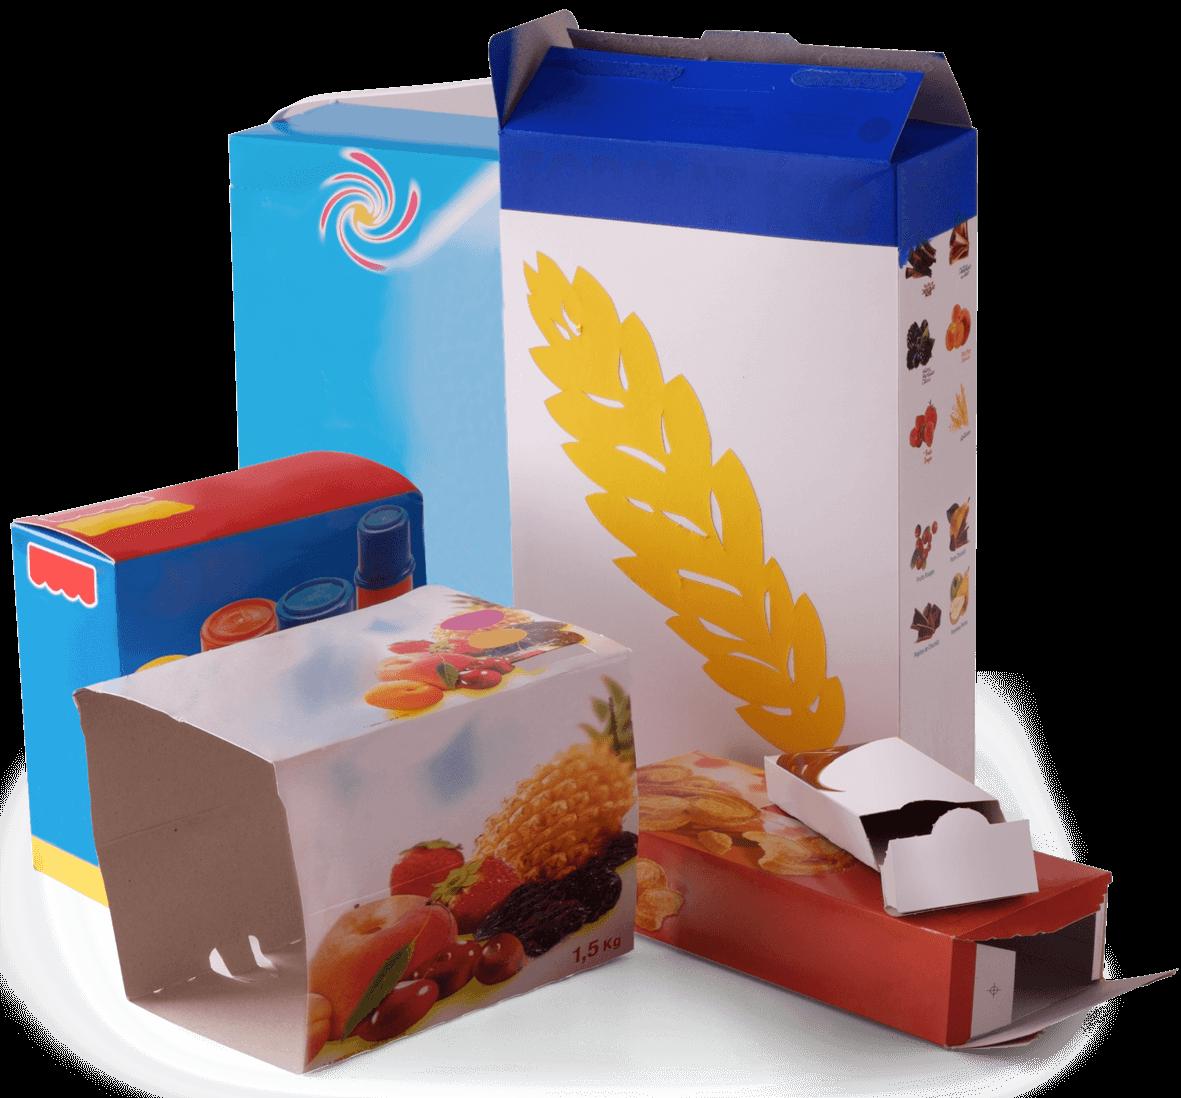 emballage alimentaire tunisie